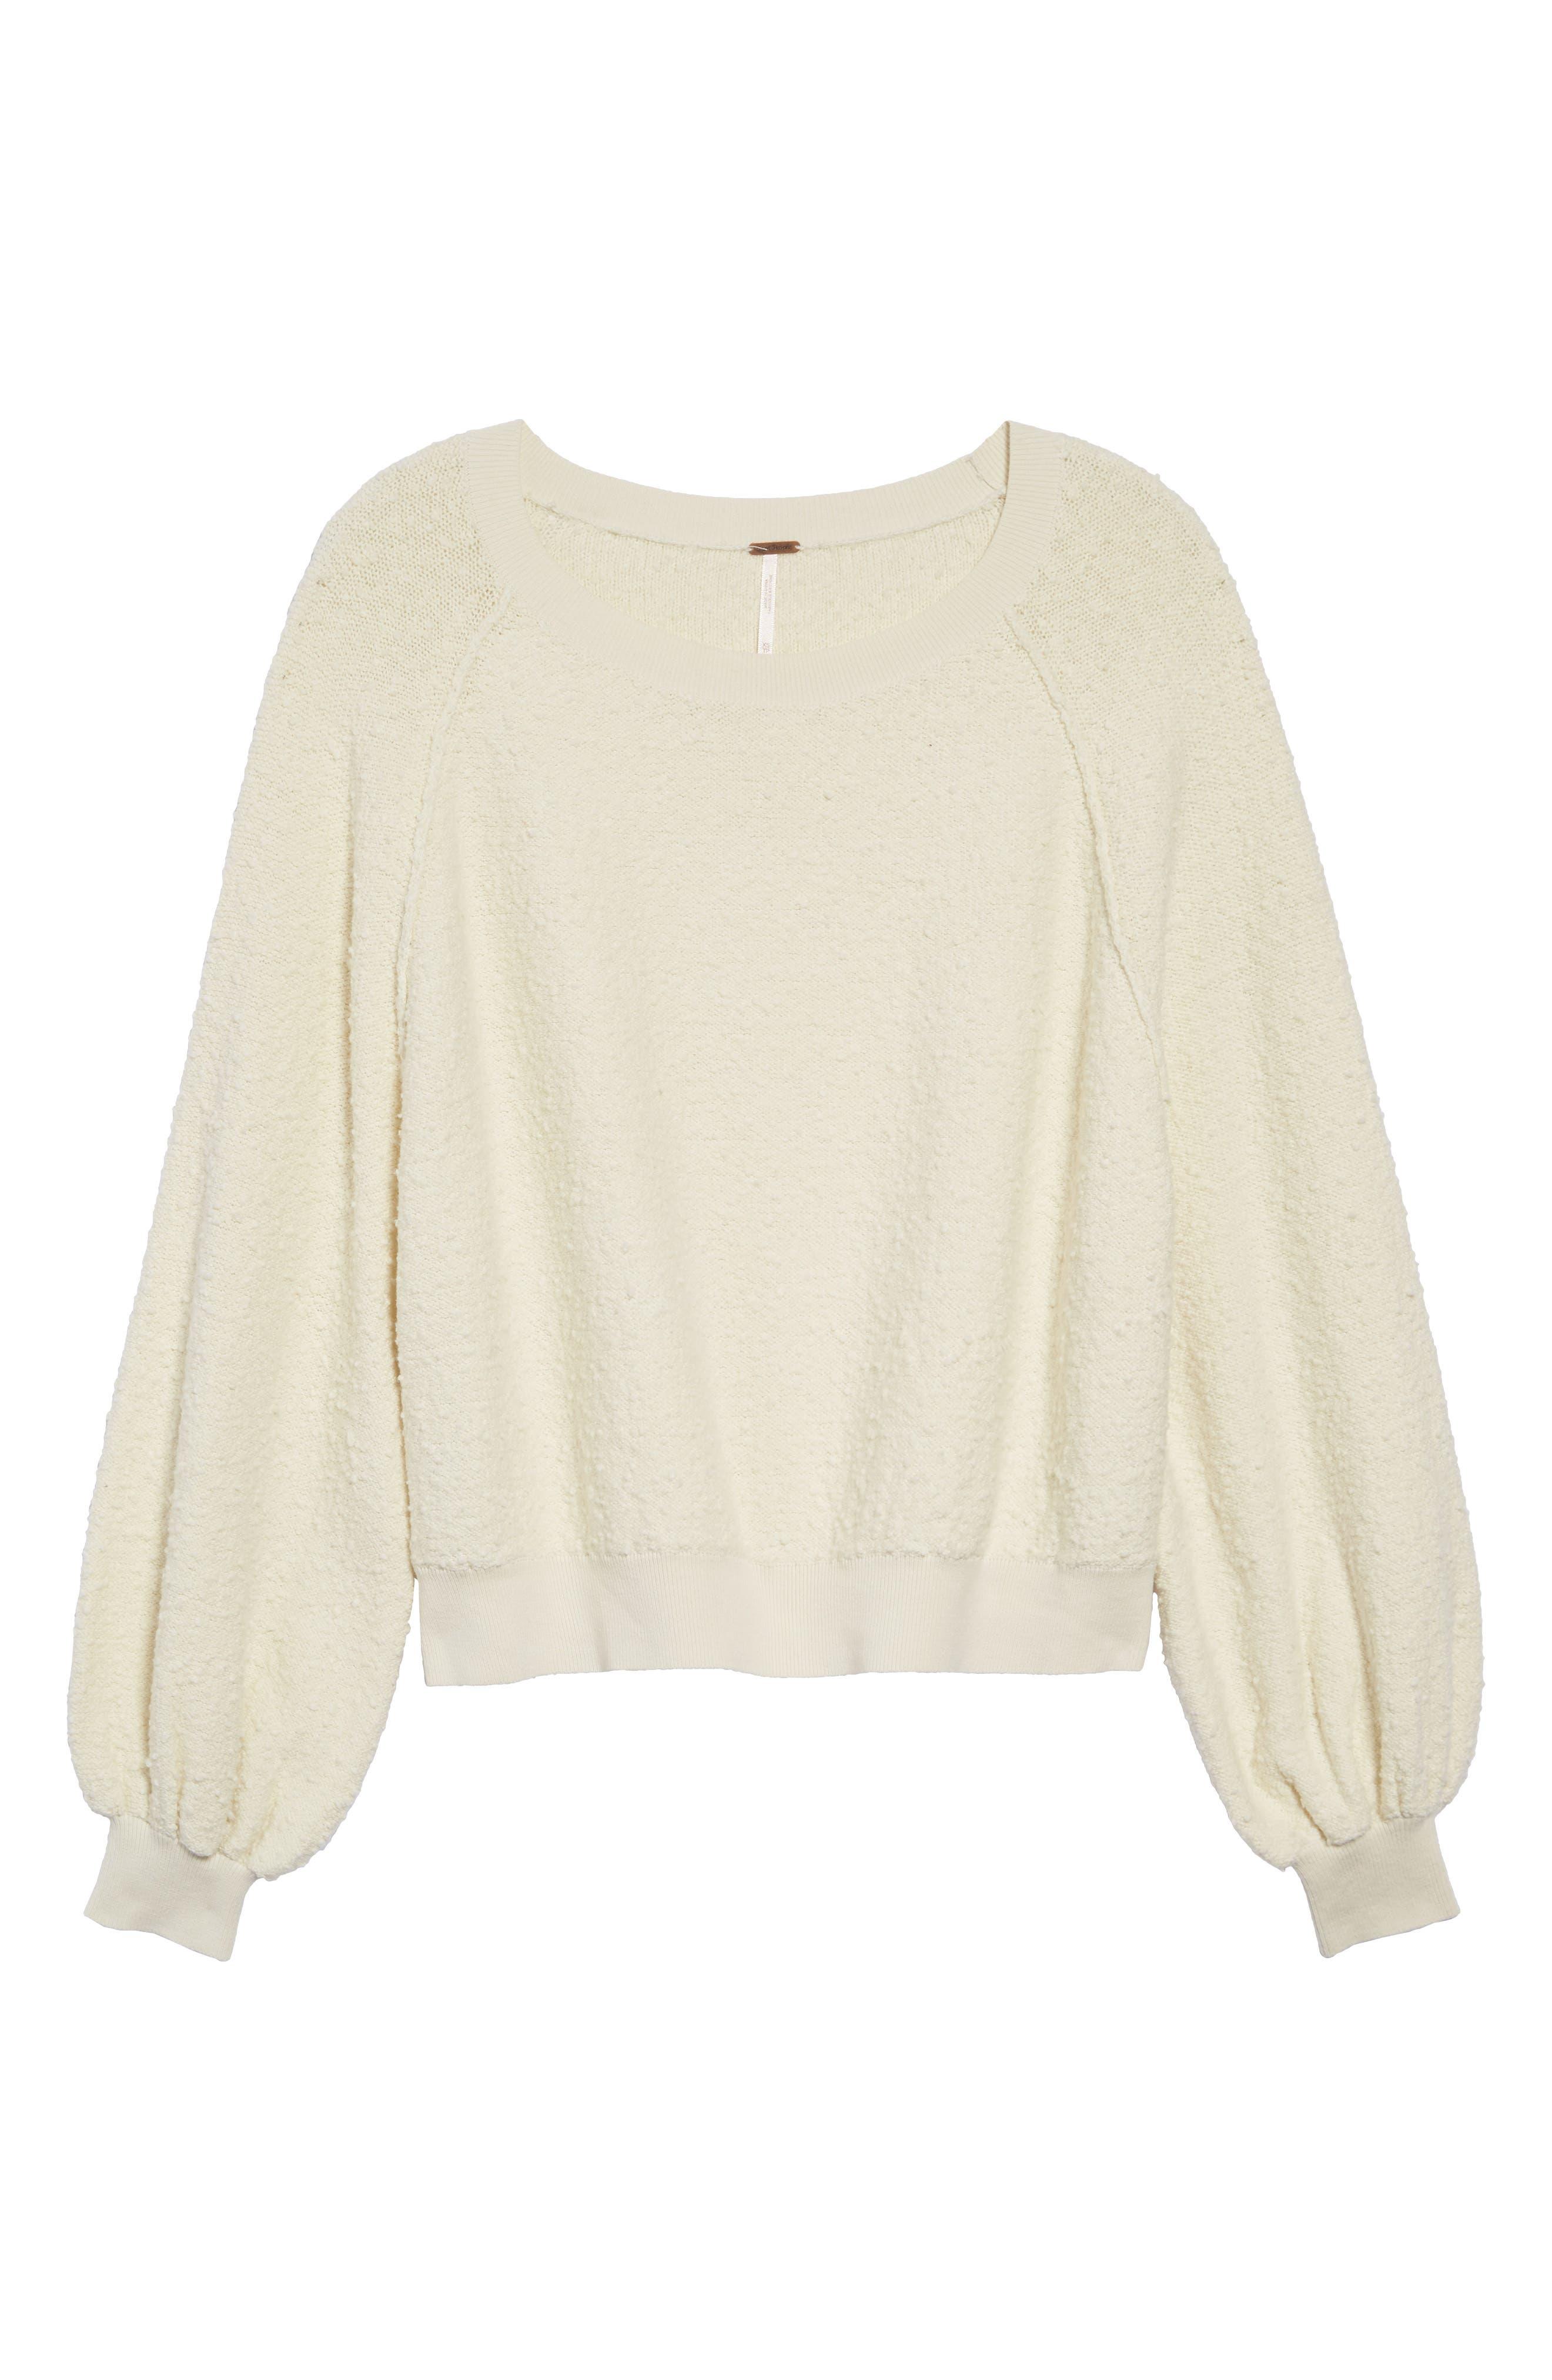 Found My Friend Sweatshirt,                             Alternate thumbnail 6, color,                             IVORY